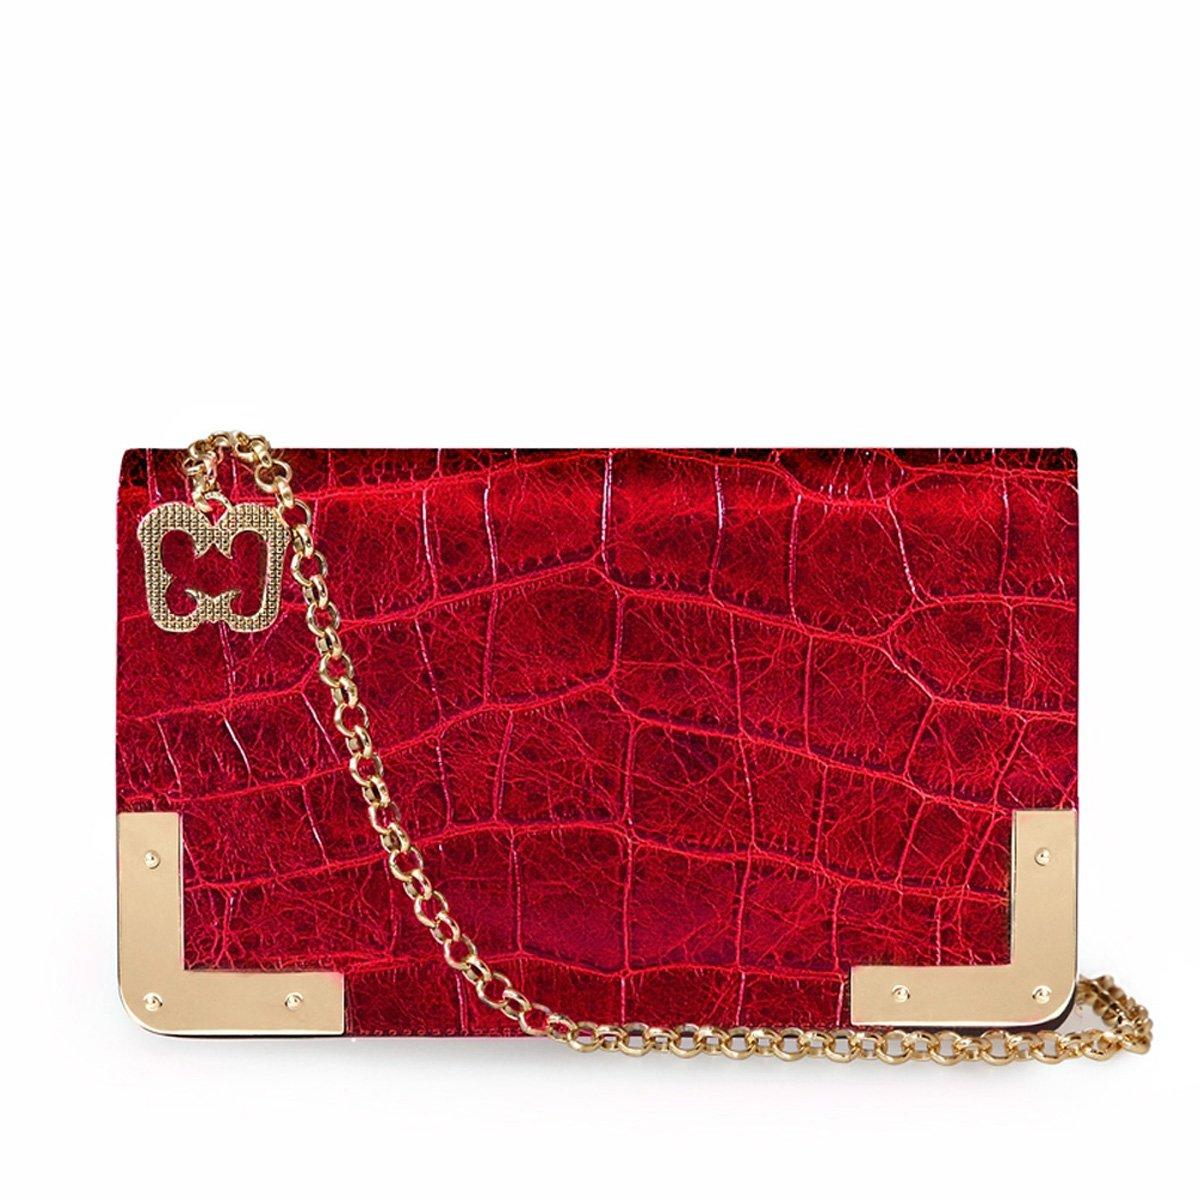 Eric Javits Luxury Fashion Designer Women's Handbag - Cassidy - Red